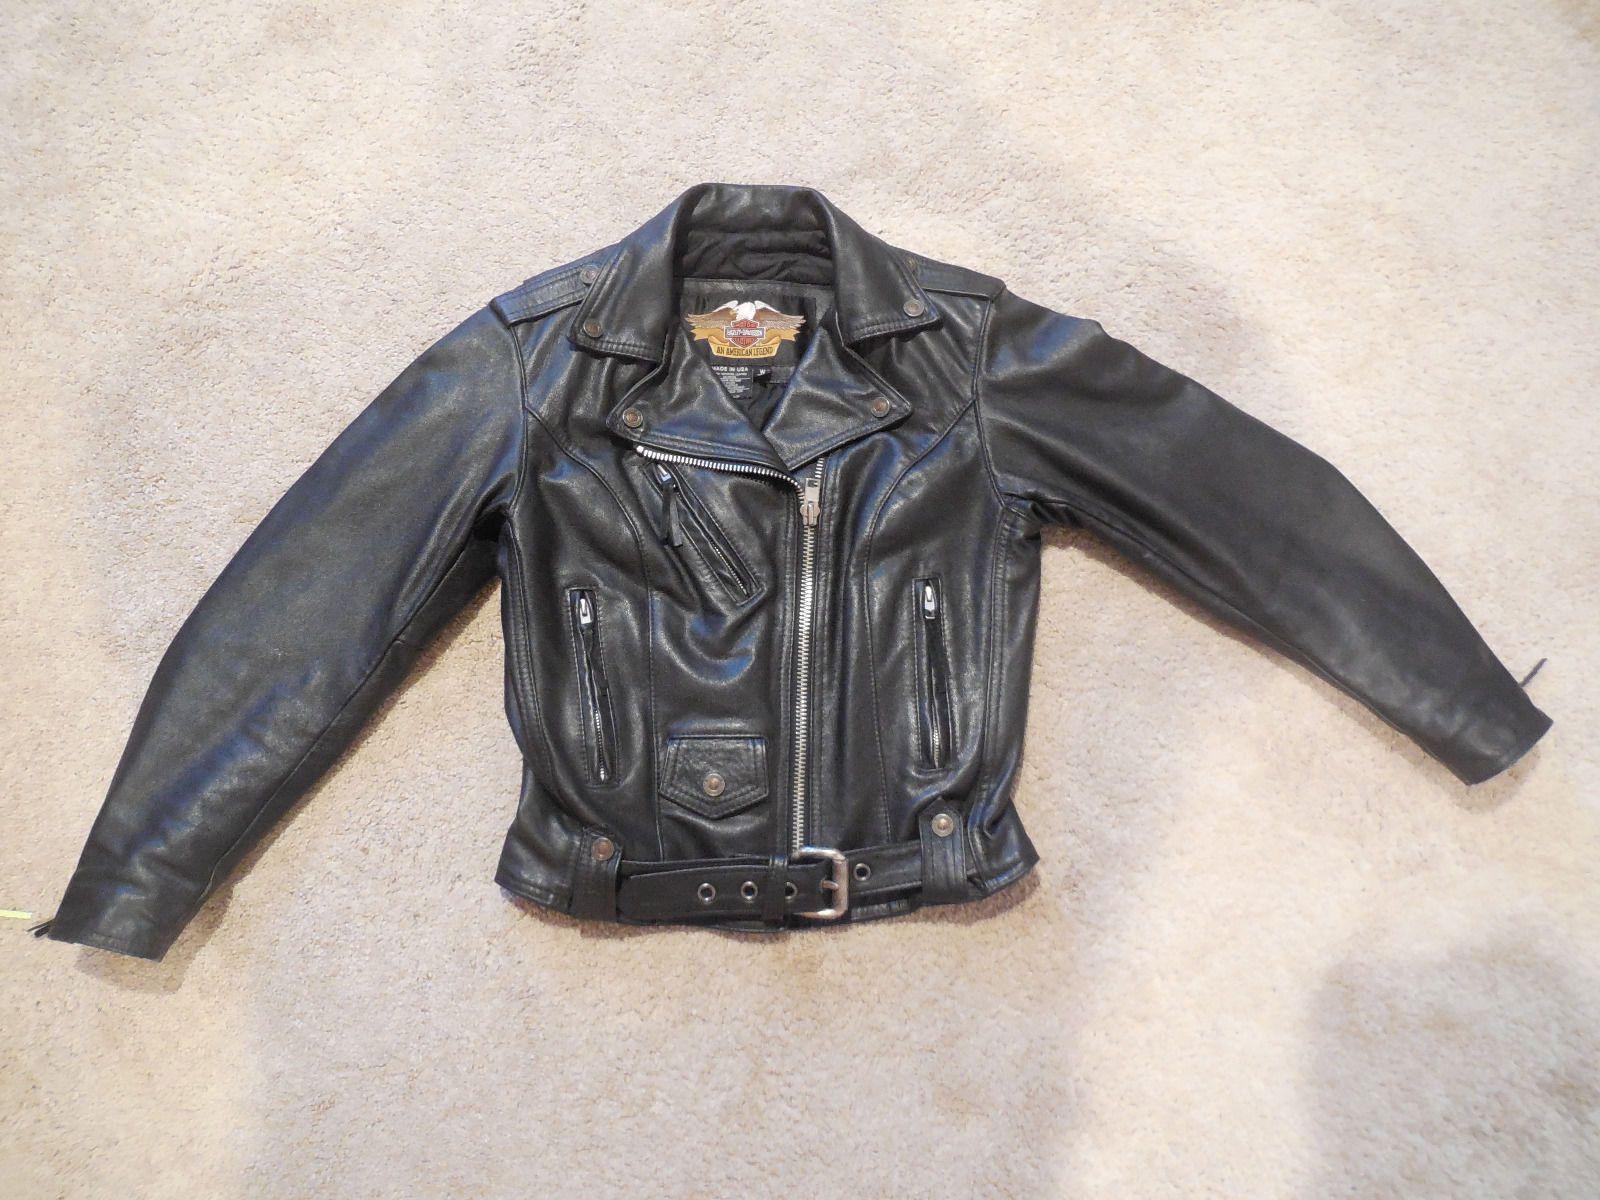 Harley Davidson Women Leather Jacket Xs Tipos De Motos [ 1200 x 1600 Pixel ]